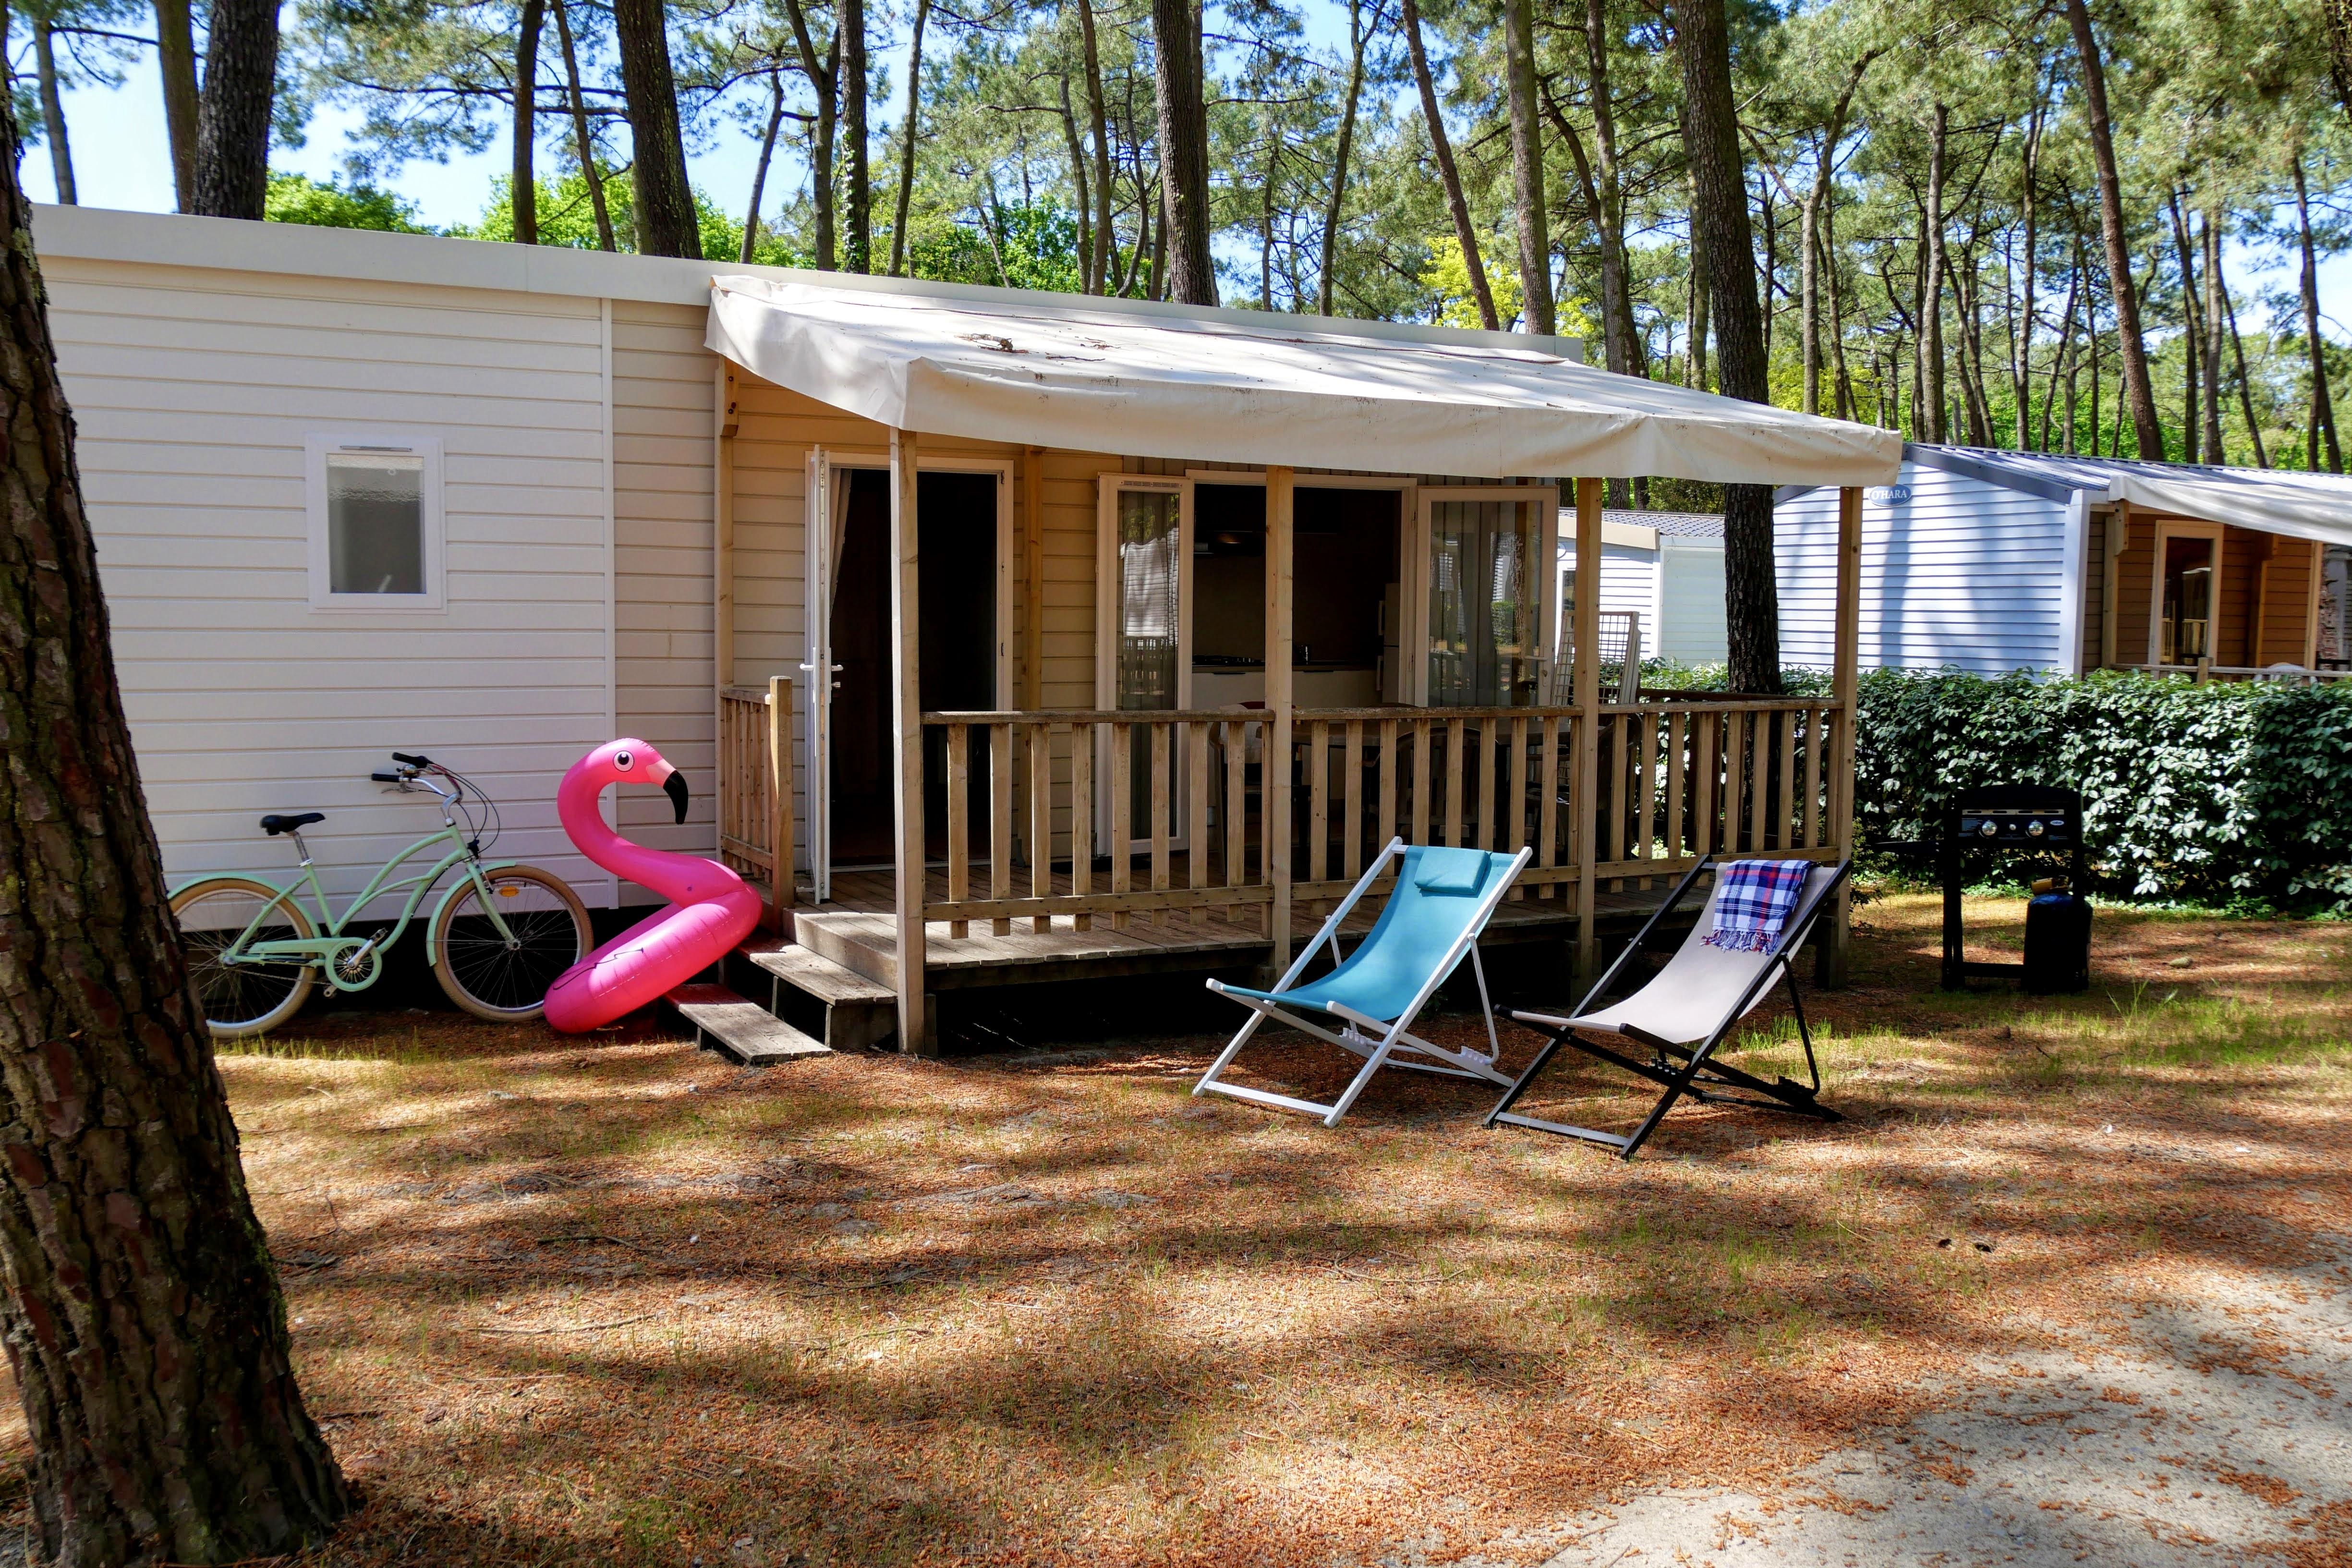 Mobil-home Confort TV 2ch | CONFORT - 26m² - terrasse couverte - TV - plancha